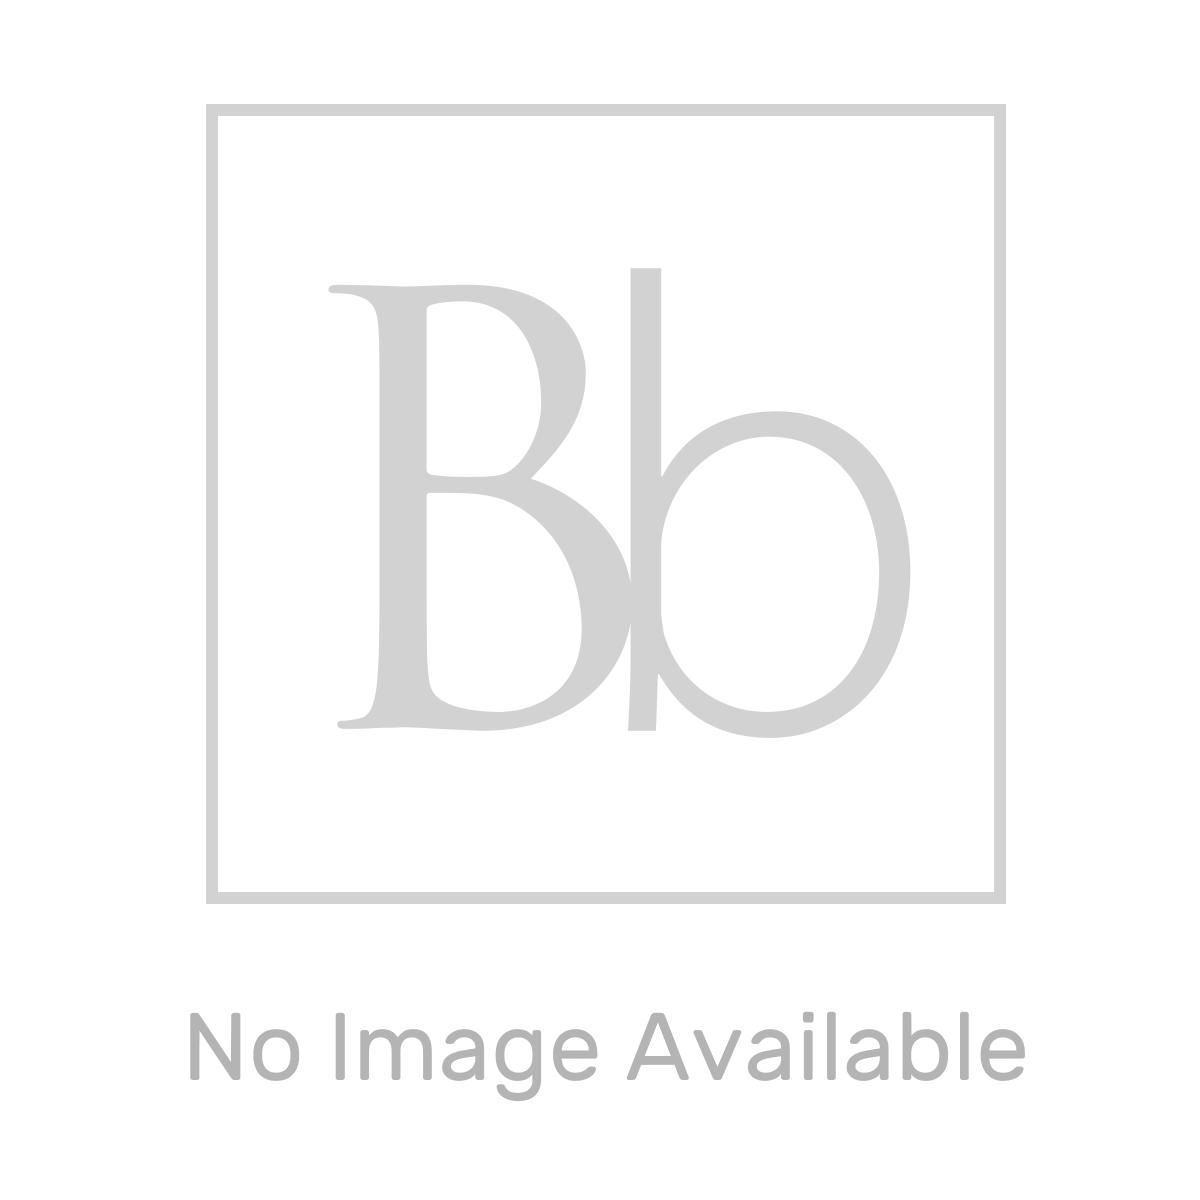 Sensio Phoenix Double Tube LED Wall Light